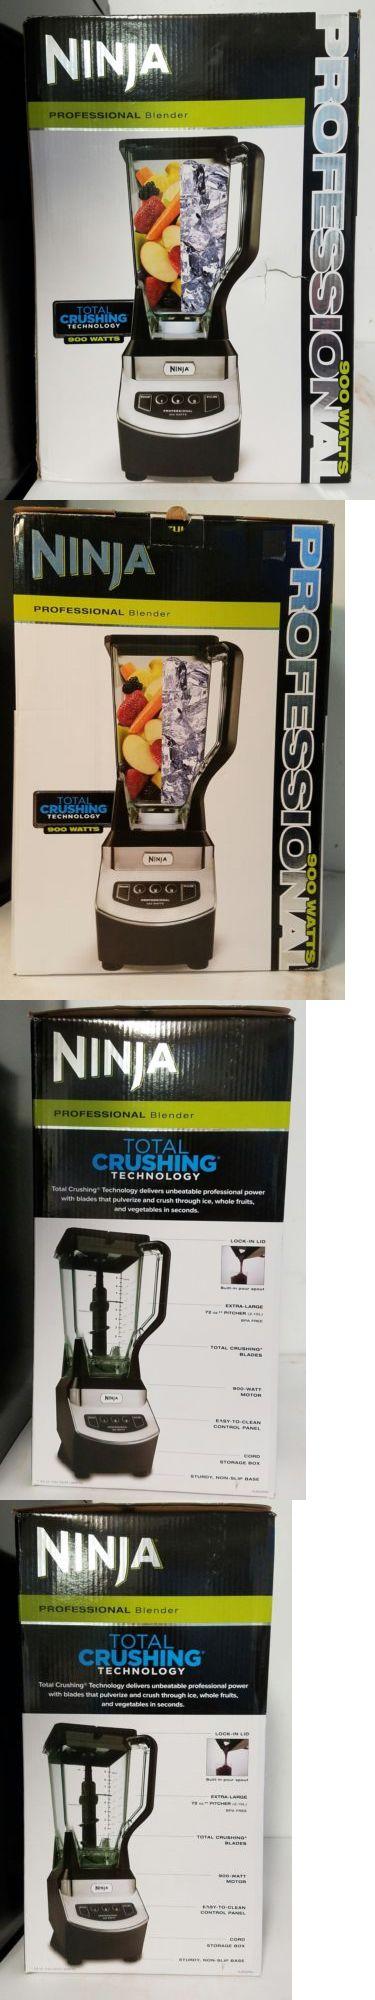 Blenders Countertop 133704: Ninja Professional Blender Nj600wm Total Crushing Technology 900W Black New -> BUY IT NOW ONLY: $50 on eBay!